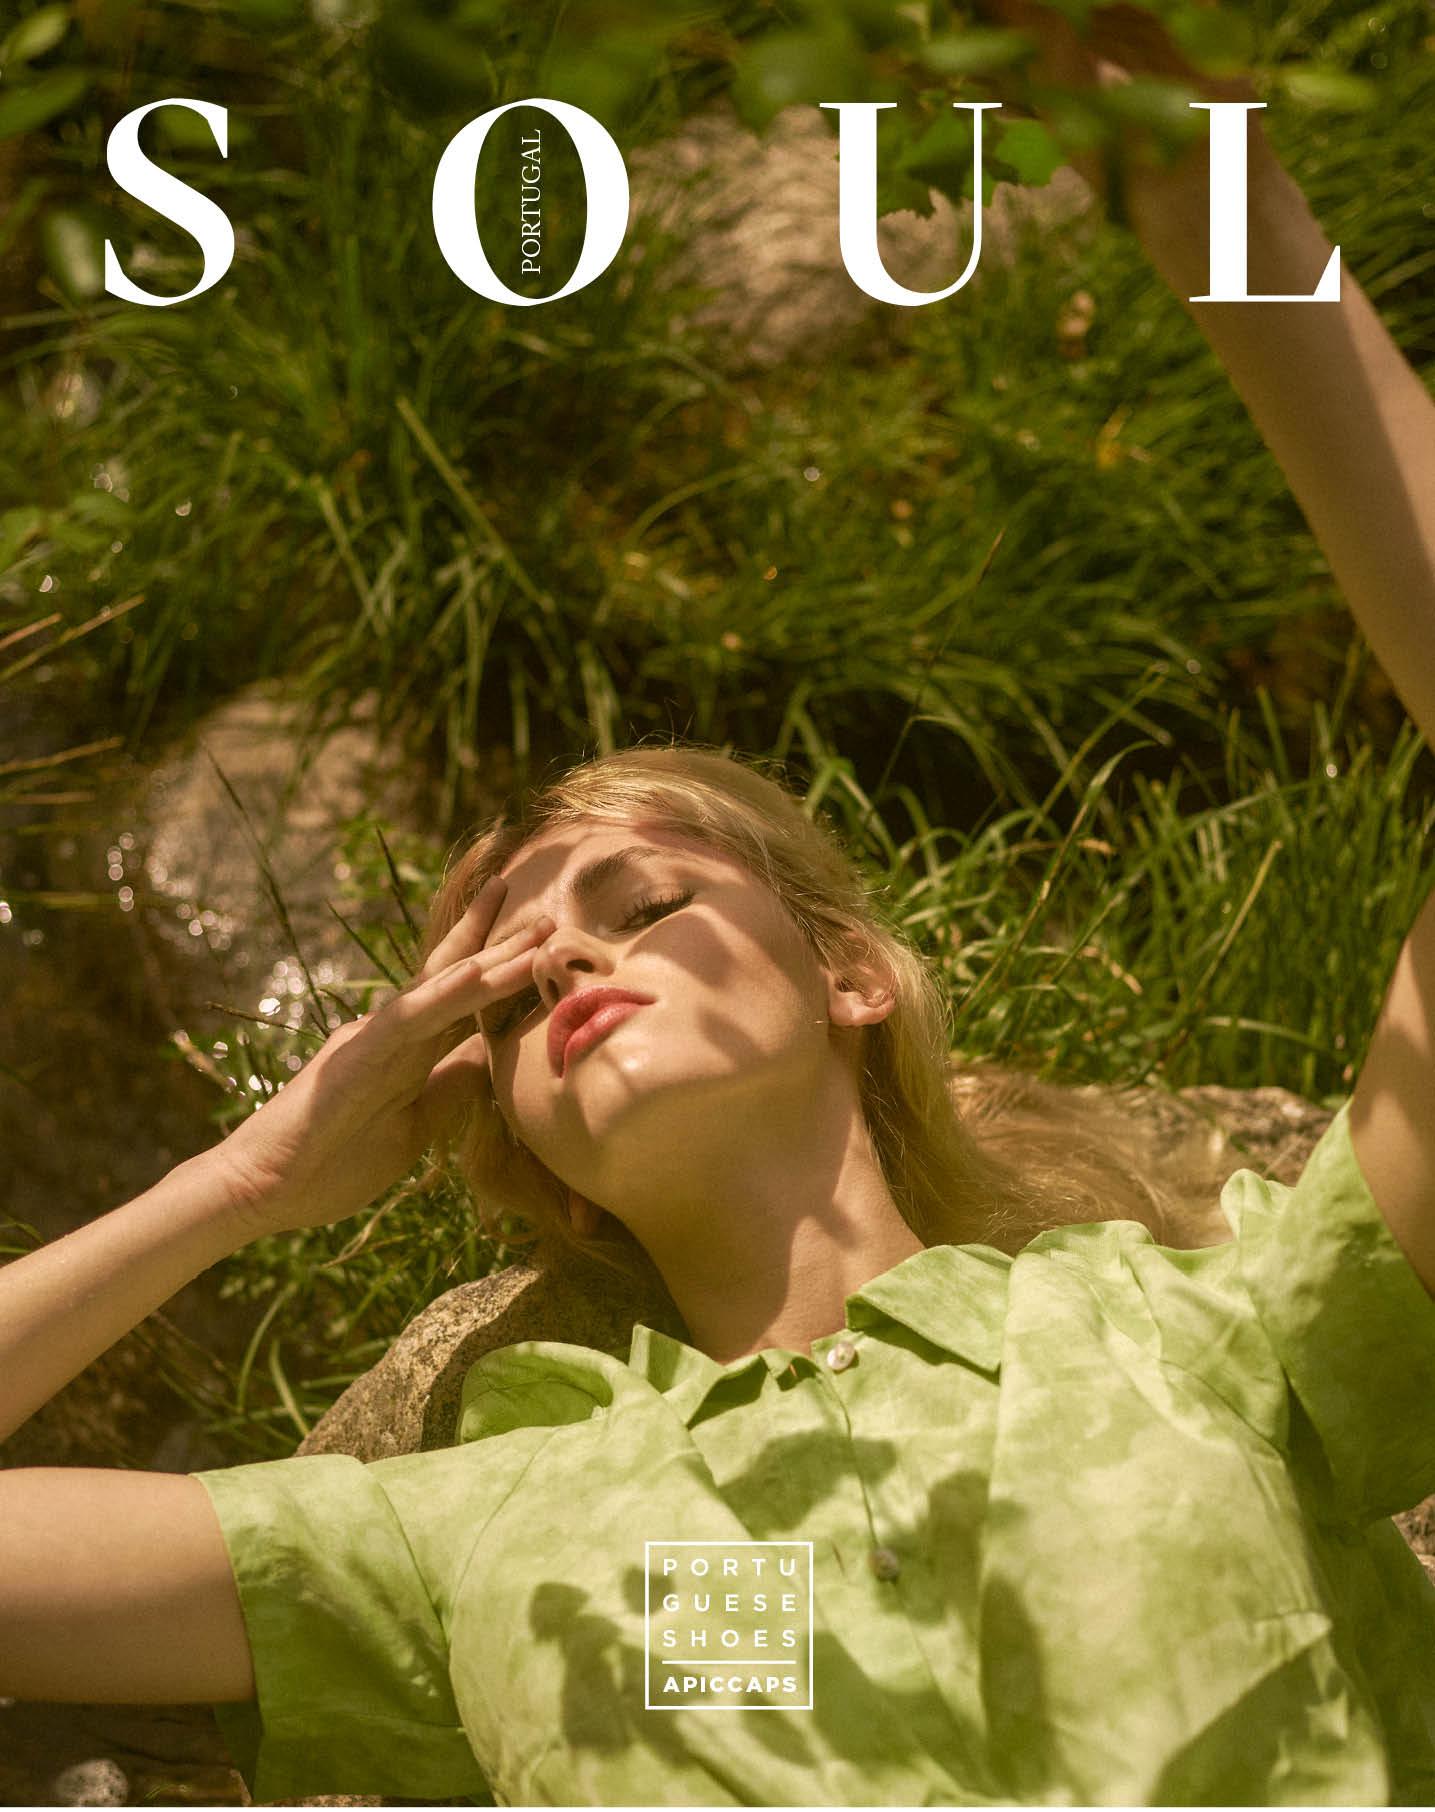 Portuguese Soul_Cover Elodie.jpg